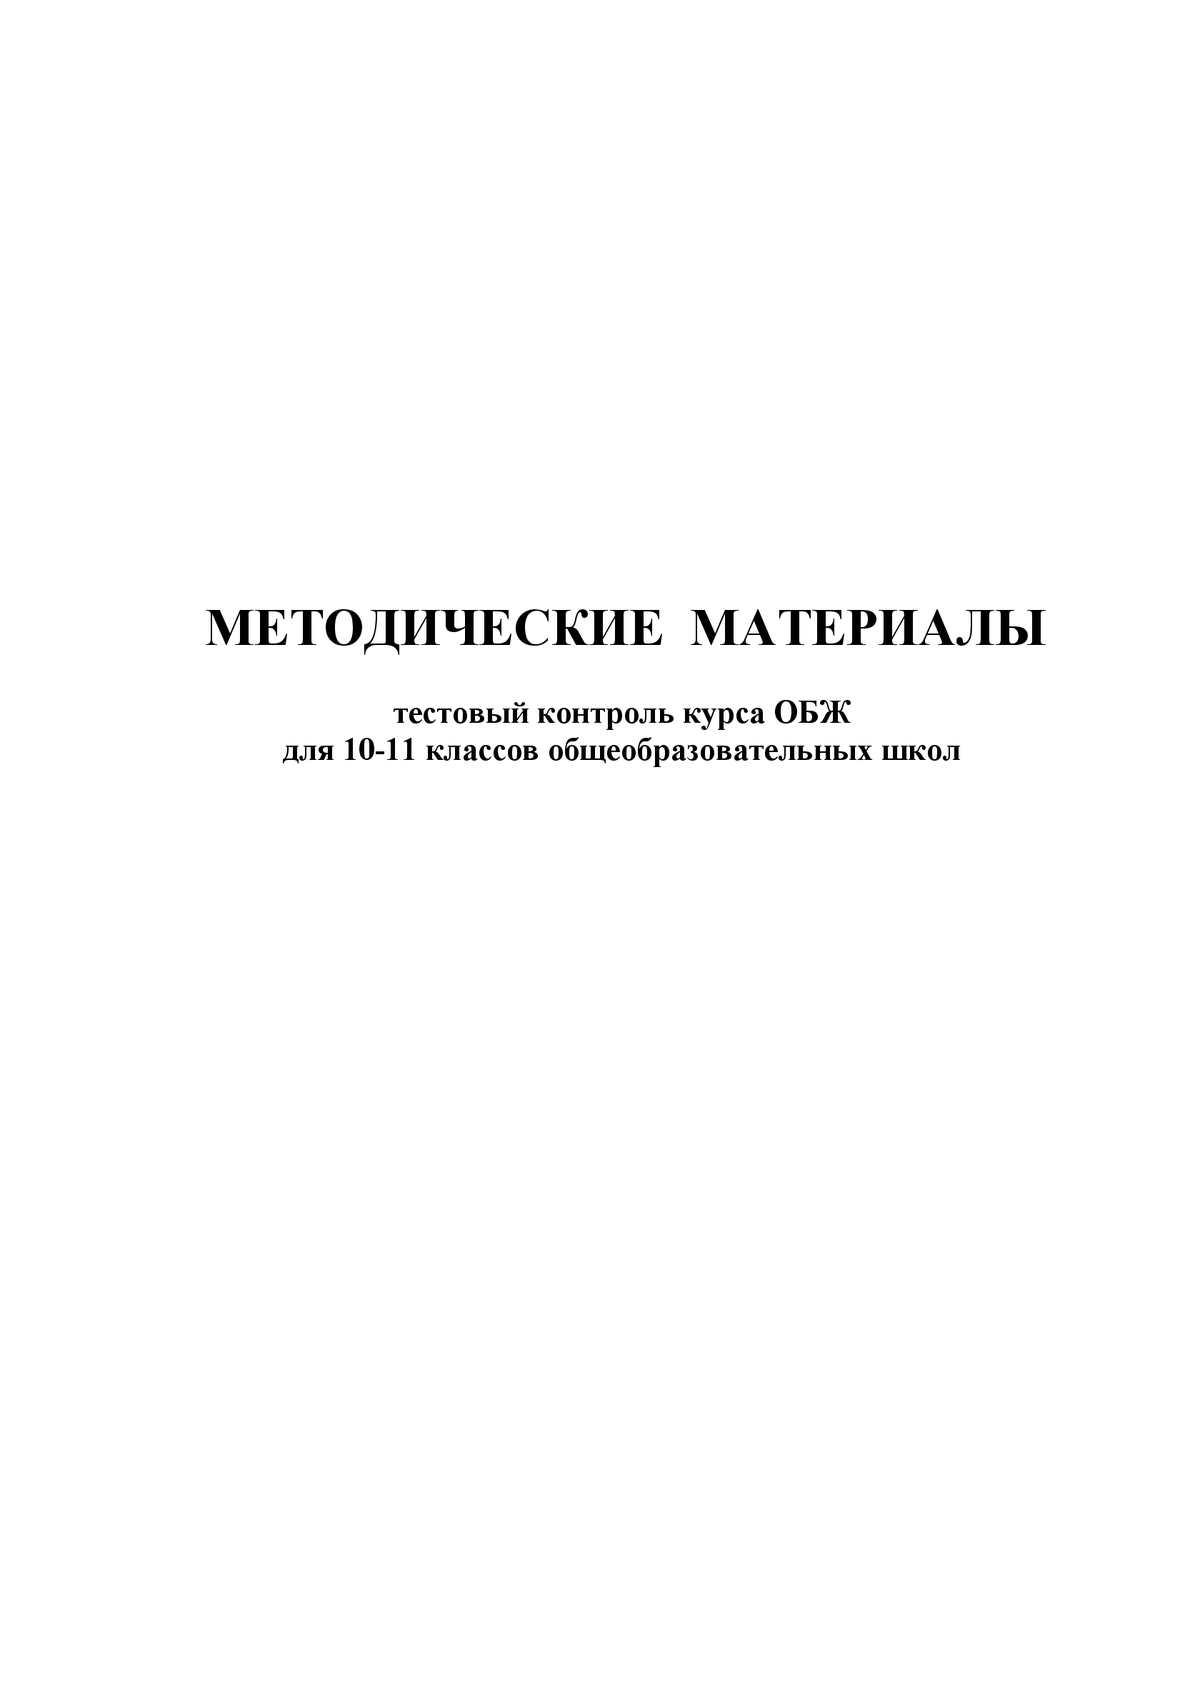 Multidisciplinary Treatment of